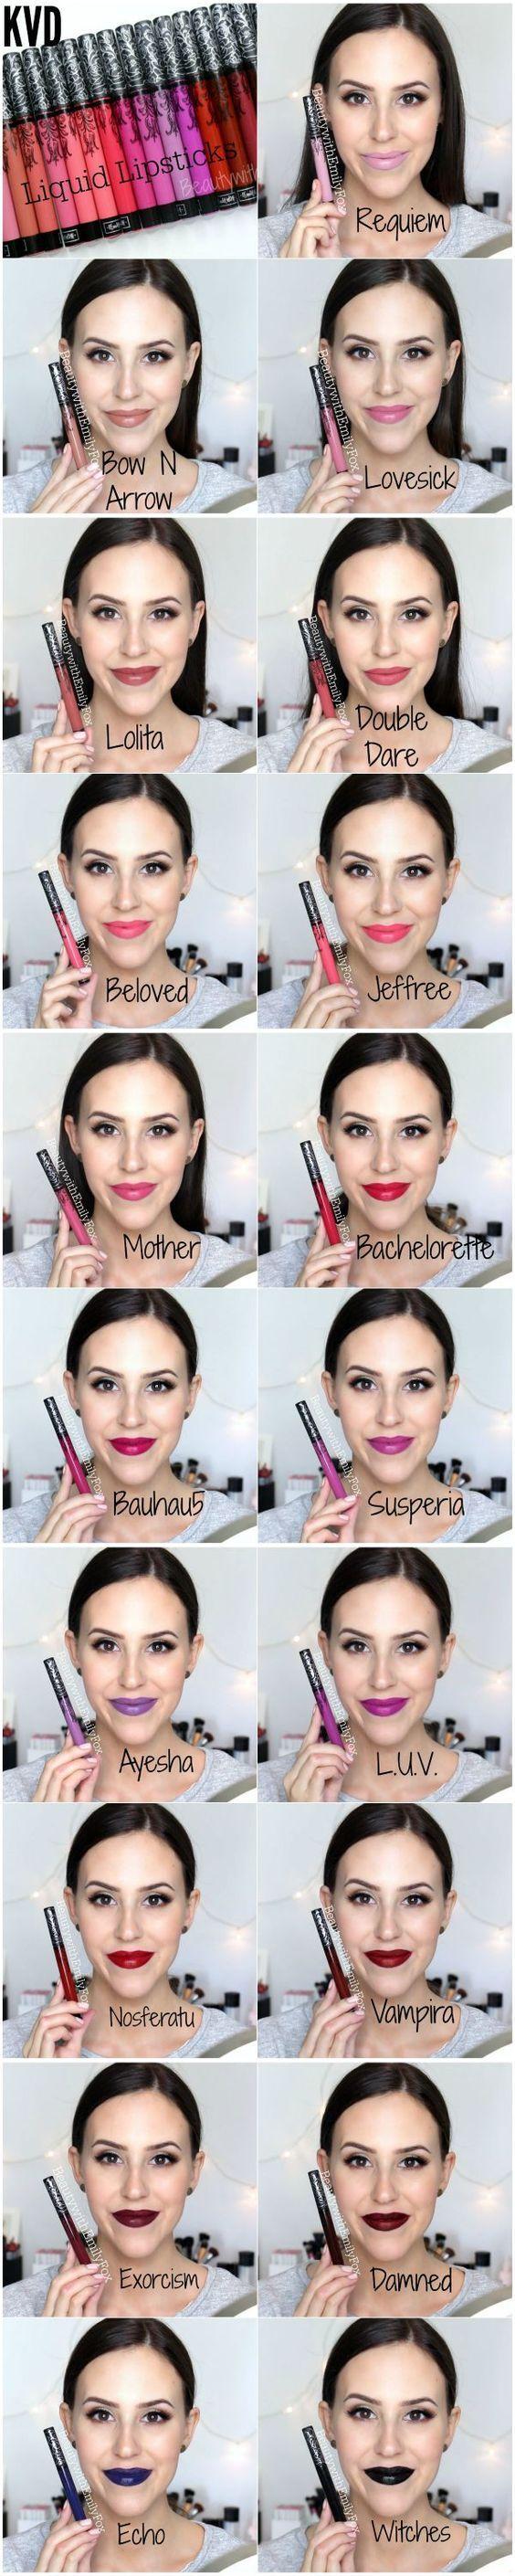 Color swatches of the top 10 best liquid lipsticks.  Lip stain | Liquid lipstick | | Long lasting lipstick | Best lipstick | Kat Von D | Sephora | Lip gloss | Matte lipstick | Makeup | Red lipstick | Nude lipsticks | Cream lip stains | Satin lip stain | Matte lippie | Best lipsticks | Best lip stains | Beauty products | Black lipsticks #longlastinglipstick